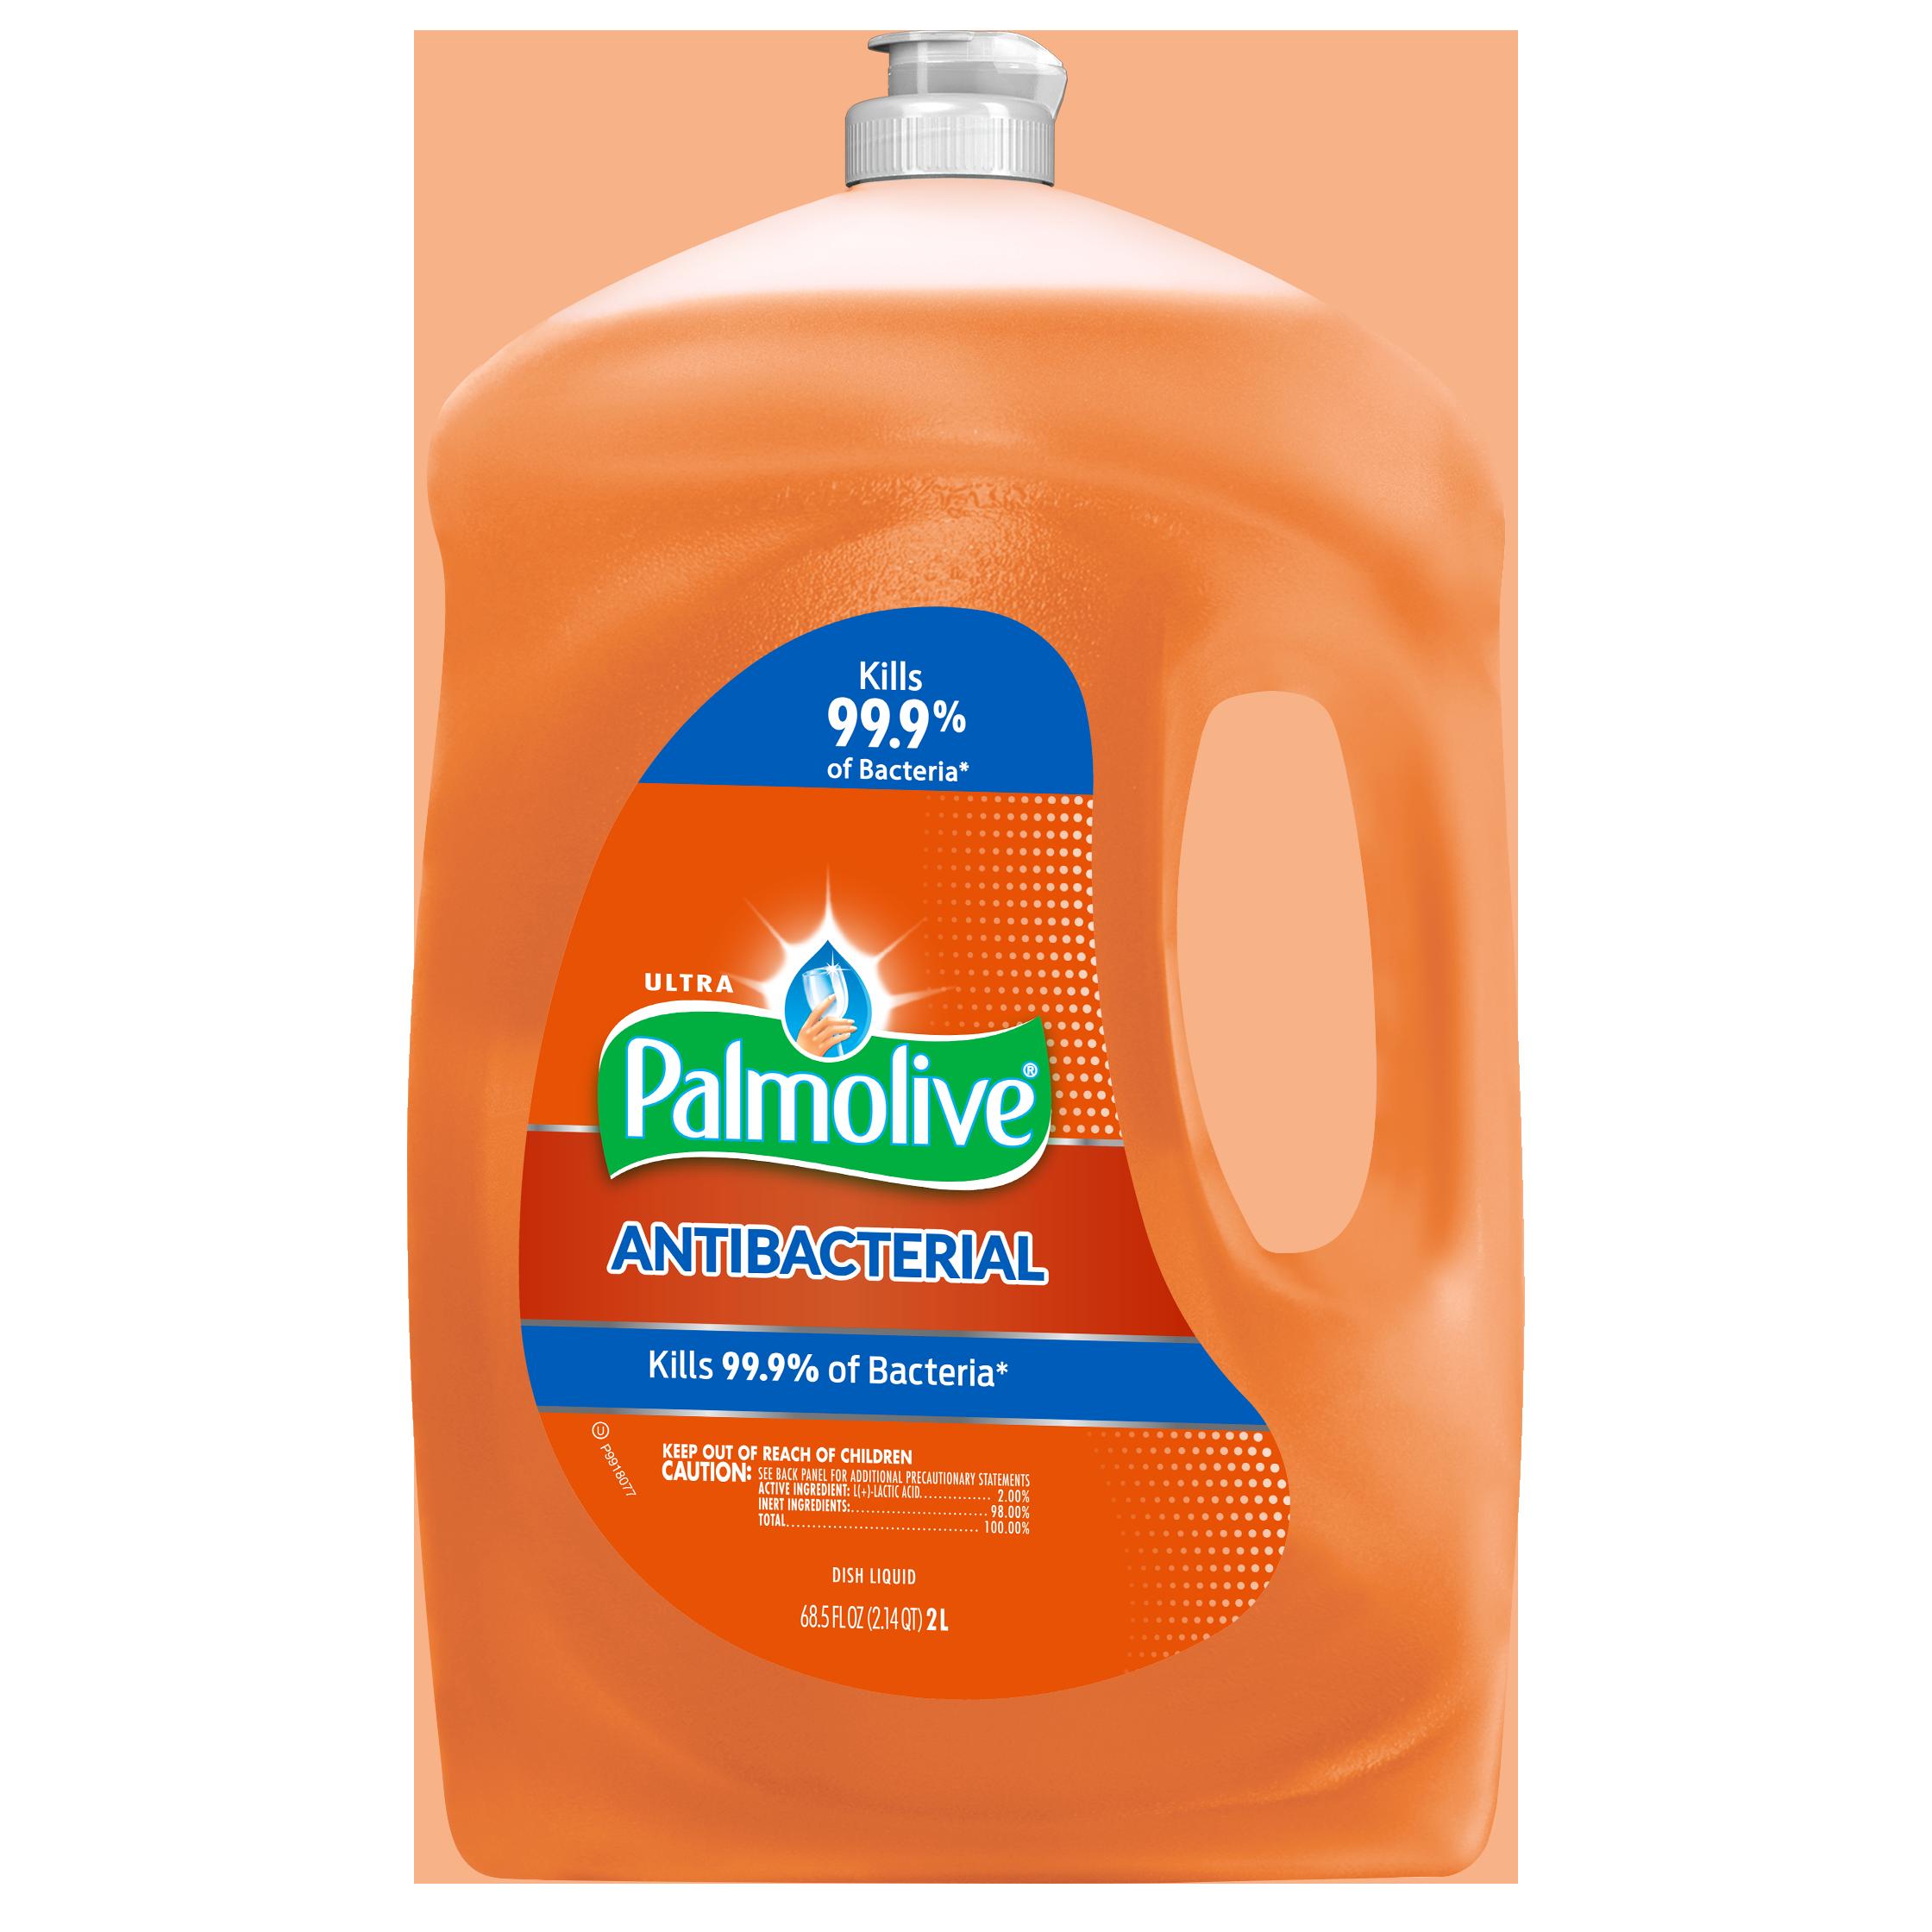 Palmolive Ultra Dishwashing Liquid, Antibacterial Orange, 68.5 Fl Oz